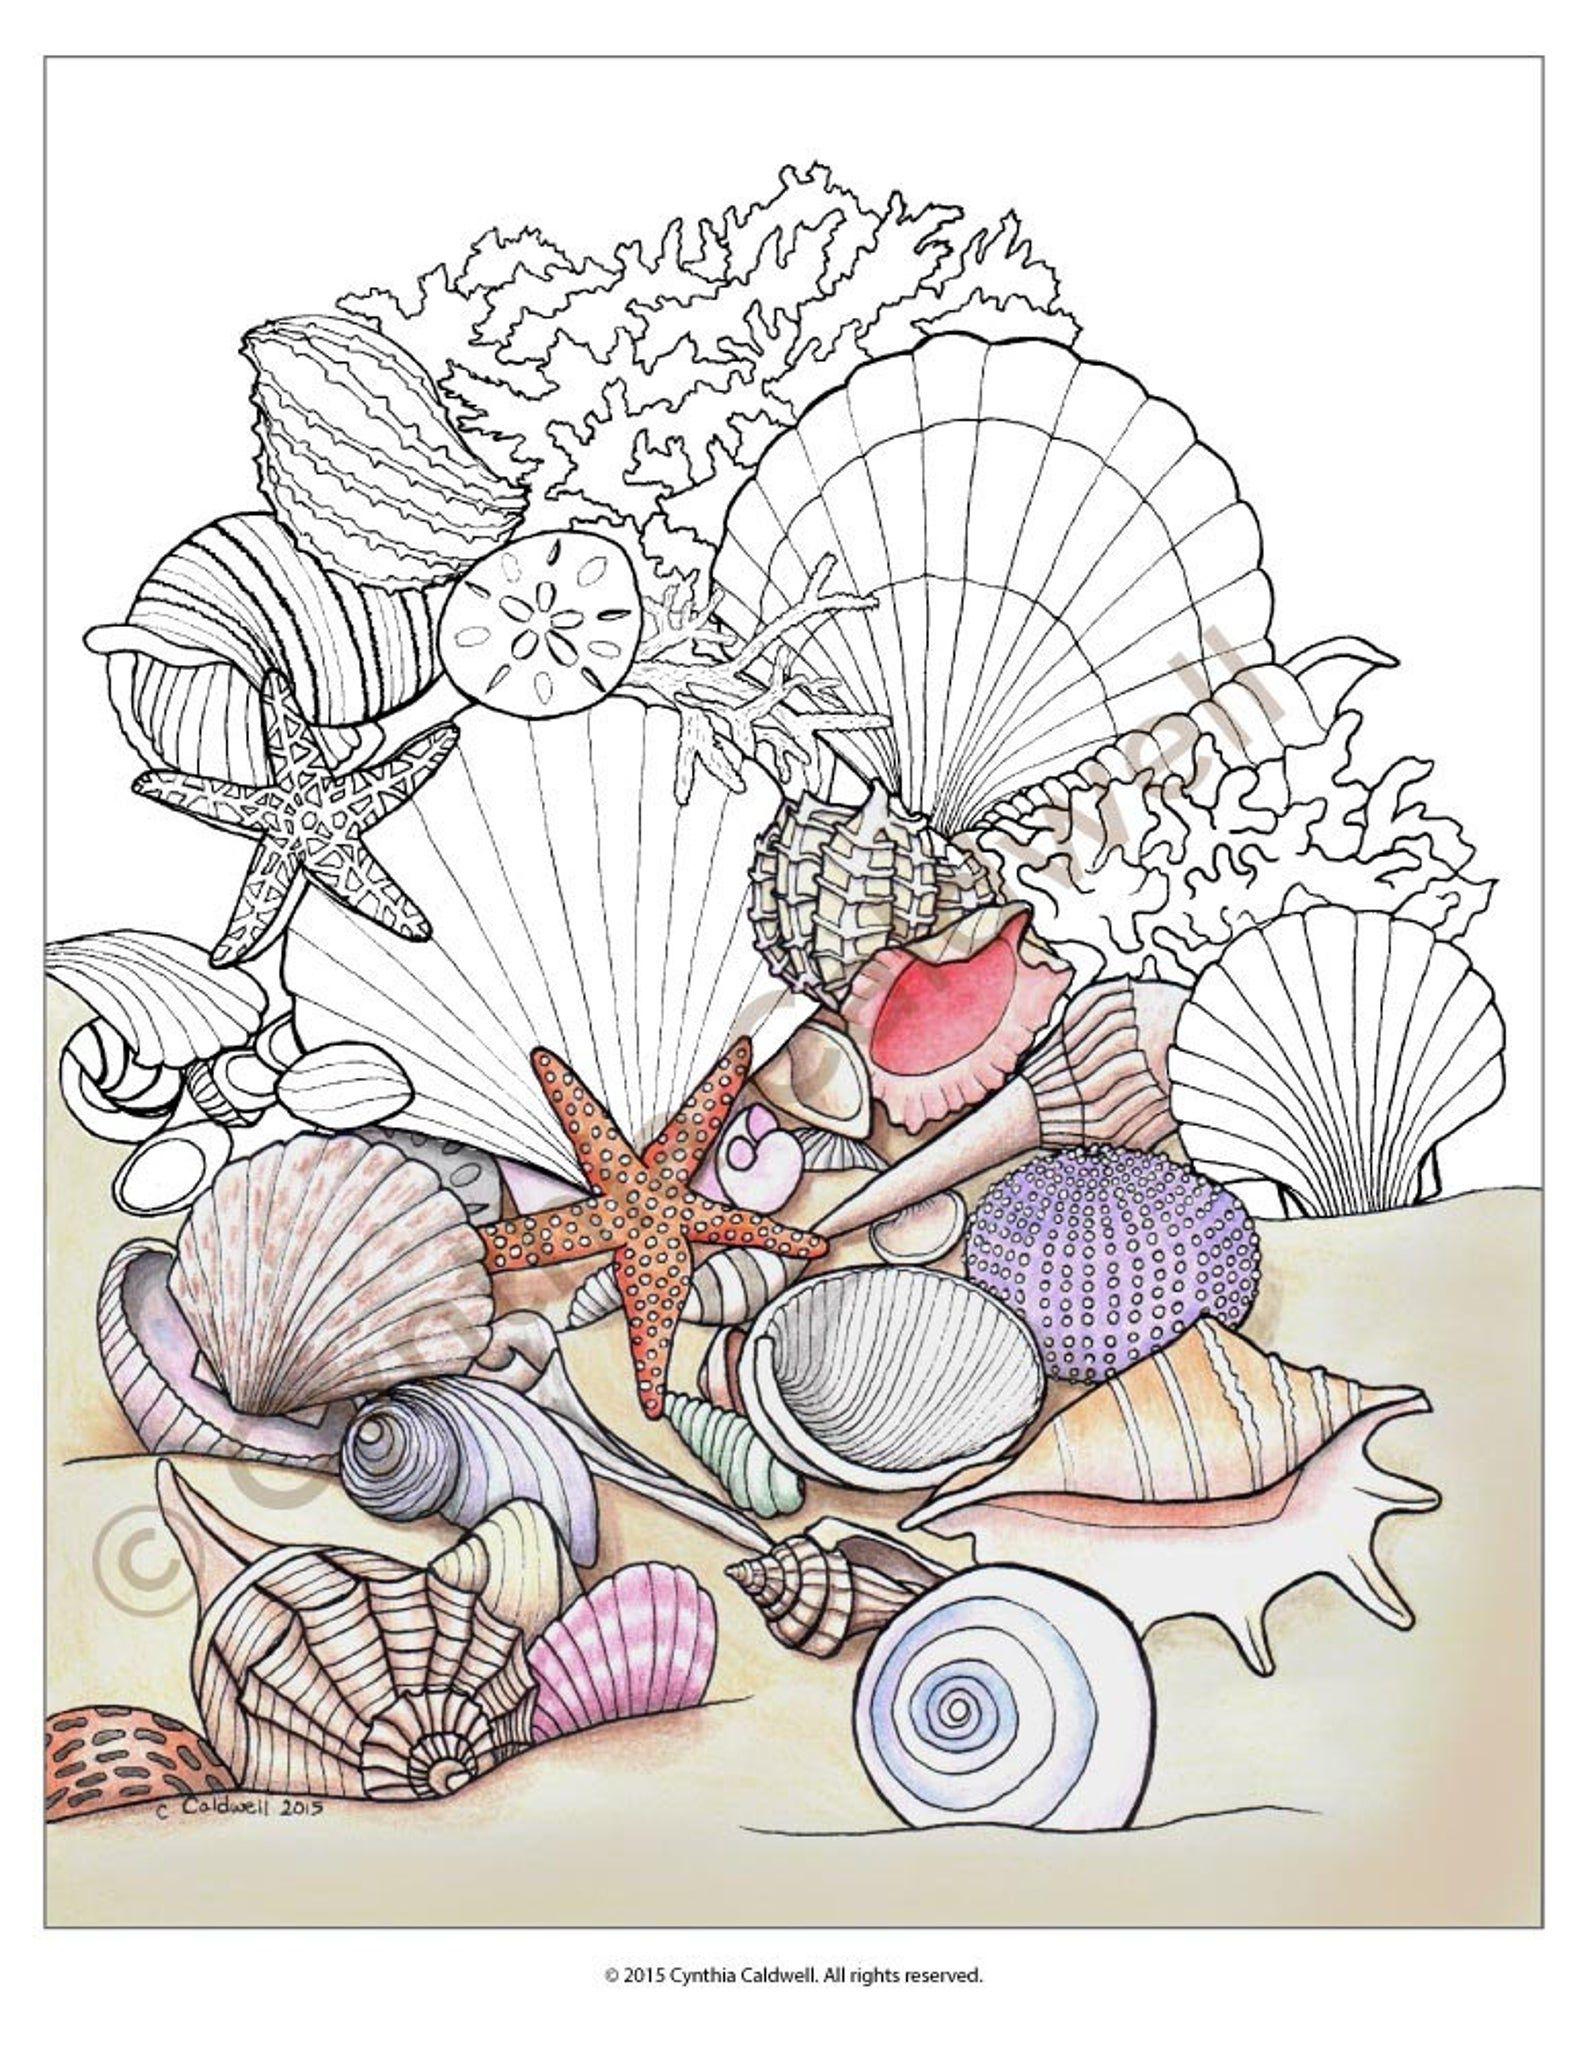 Seashells coloring book design